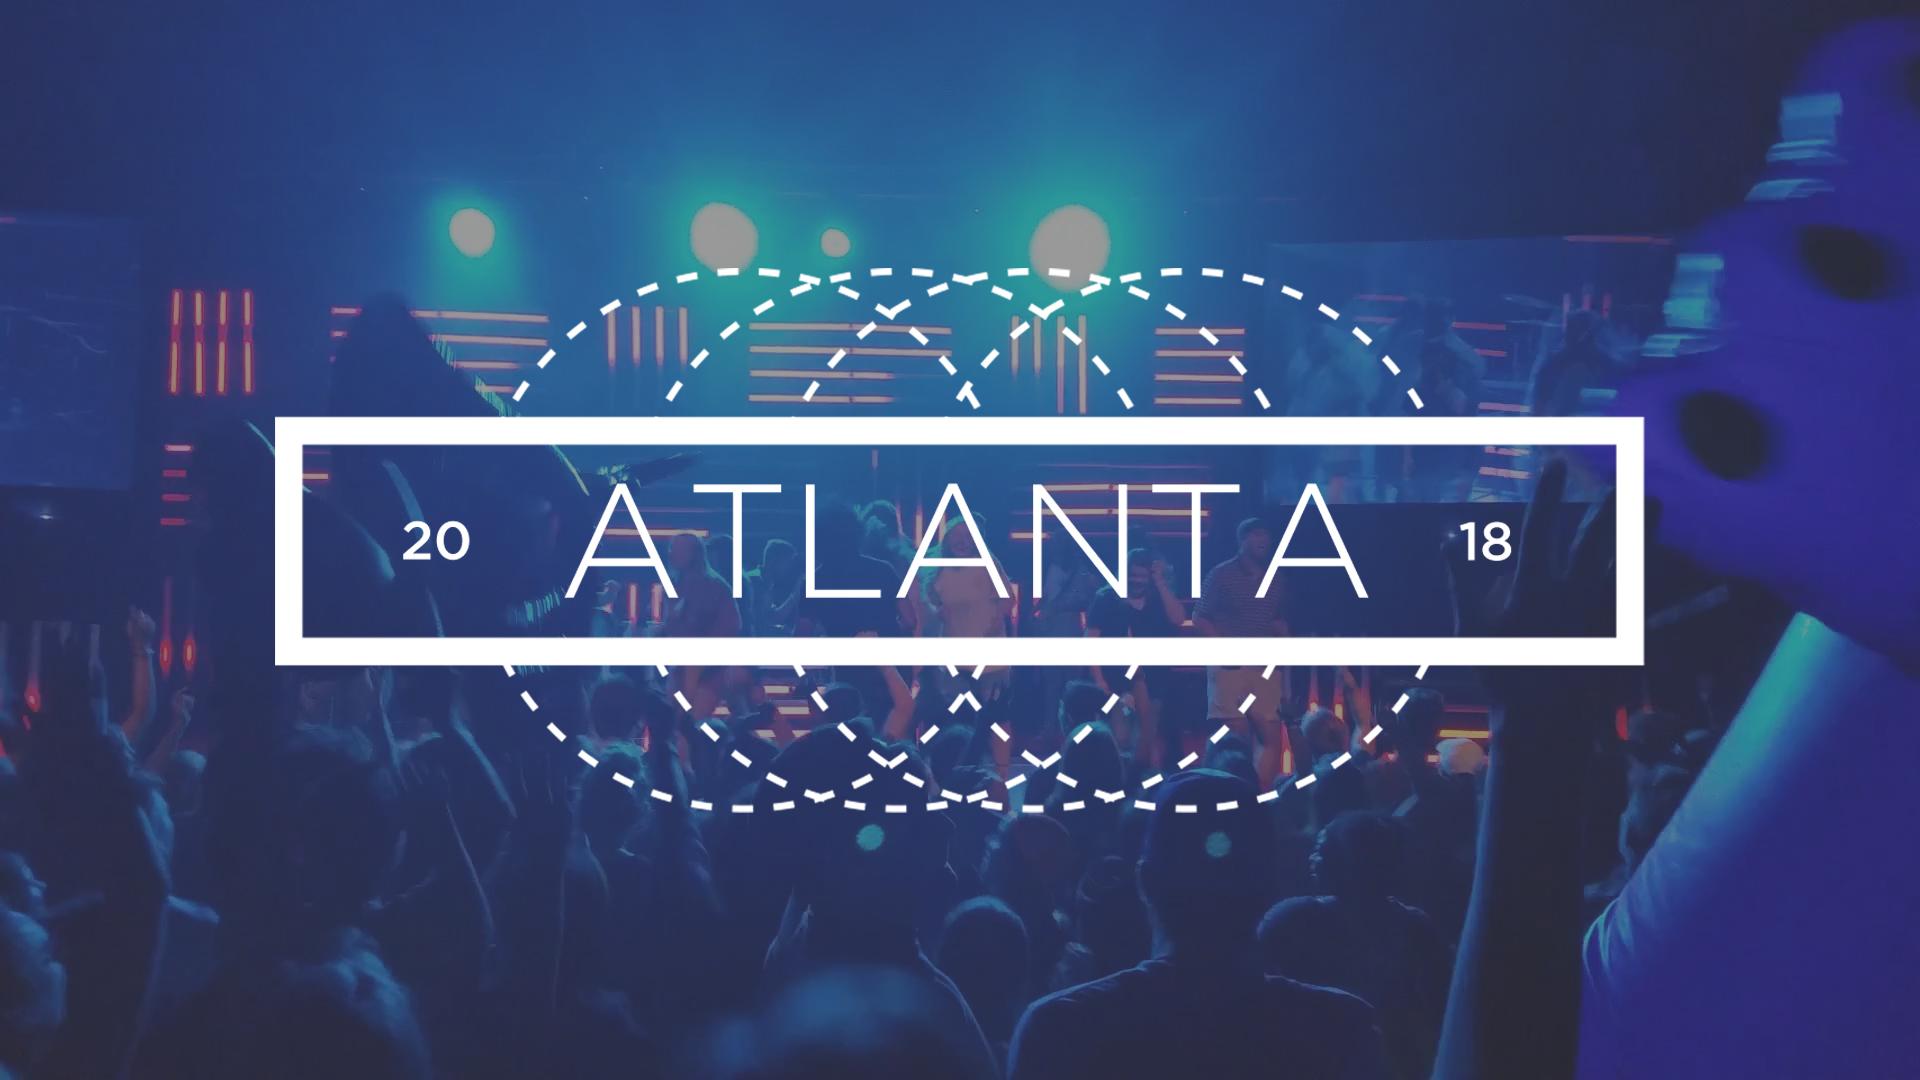 Atlantaslide